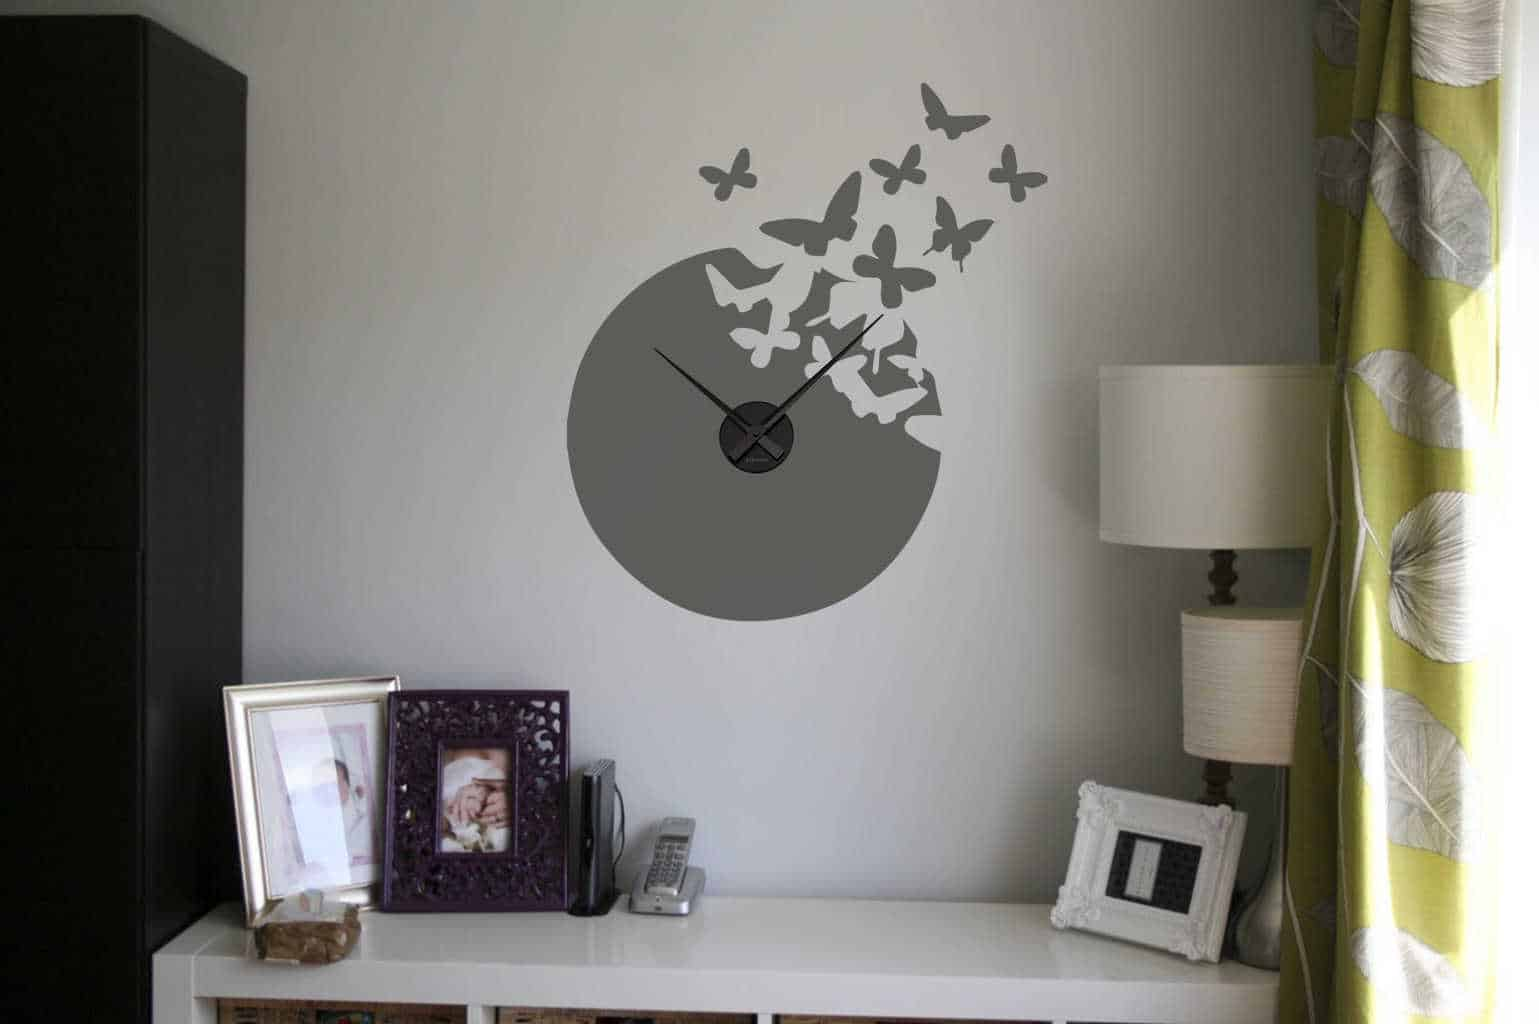 Wall decal sticker clock | butterfly